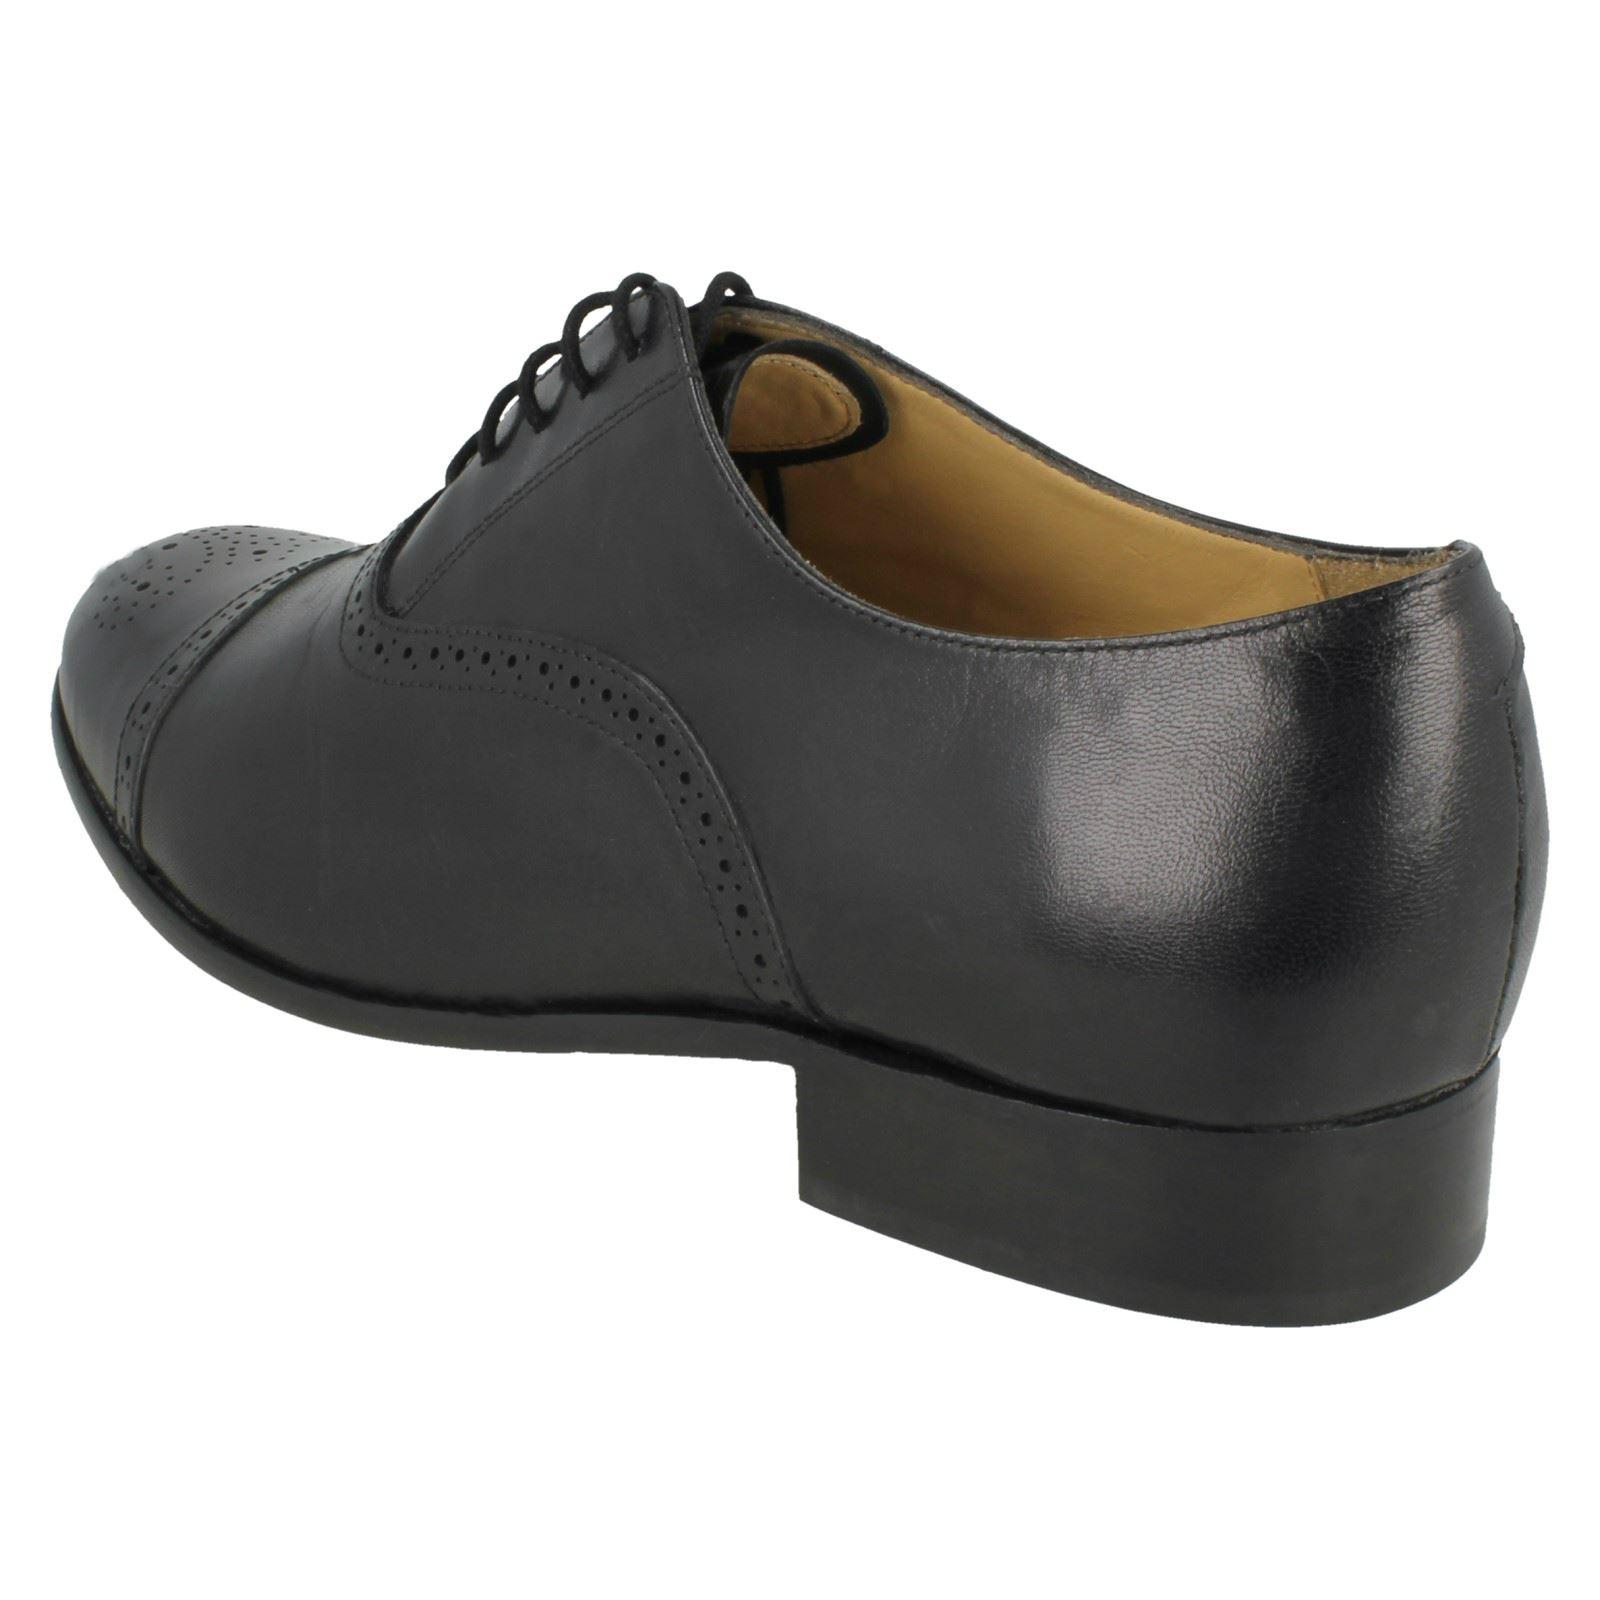 Blunt Pancras Shoes Formal Smart Mens Thomas Leather St Black pAU5x6xq